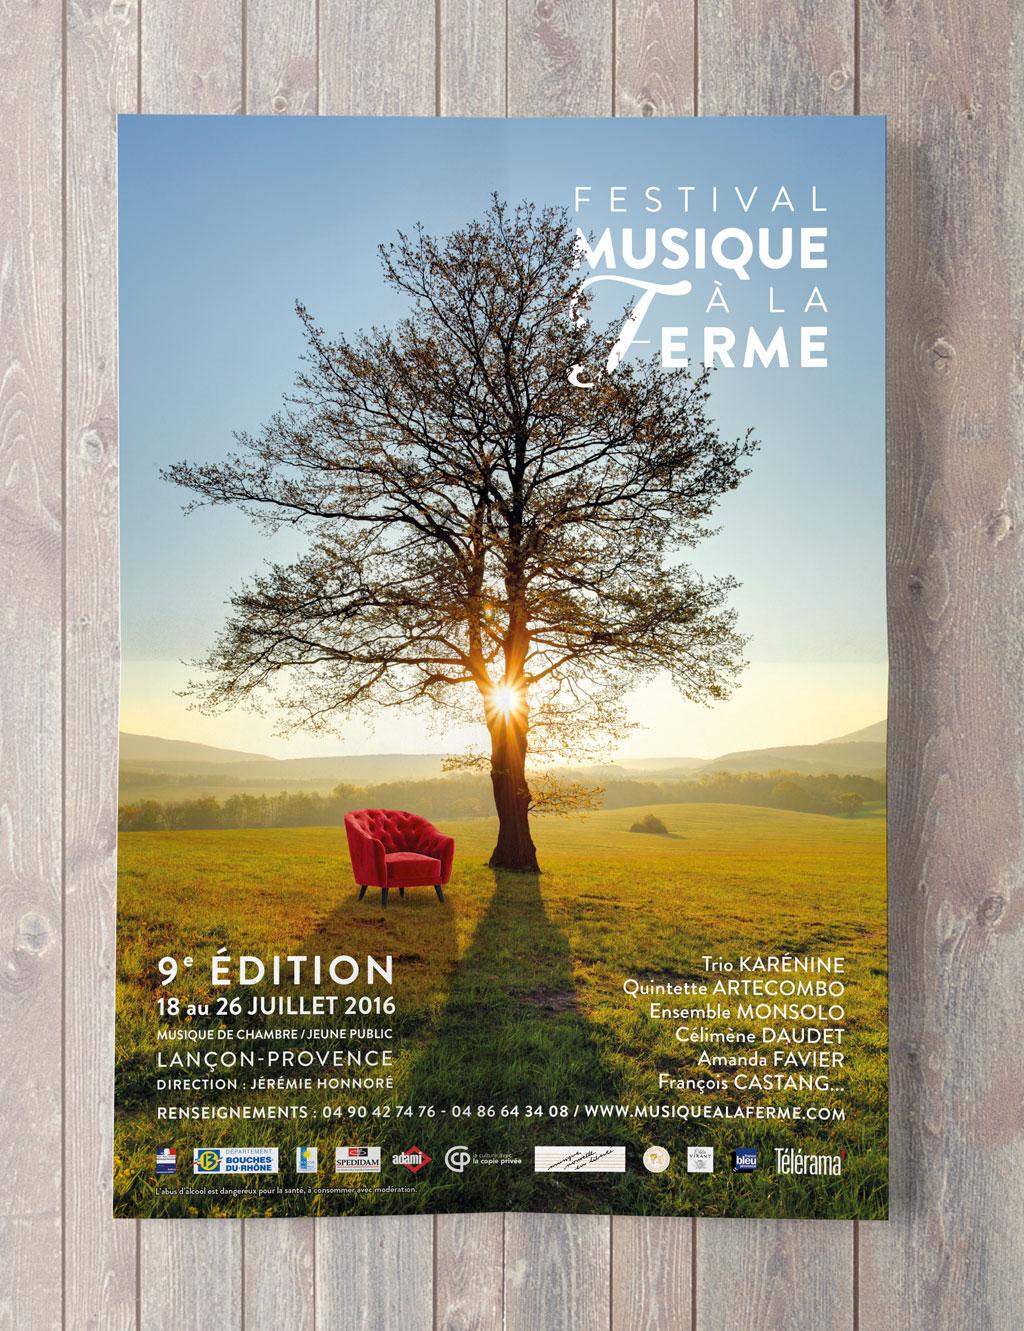 Poster for the Classical music Festival Musique à la Ferme during the 2016 summer in Provence © Calliopé Studio, Marine Pavé 2016